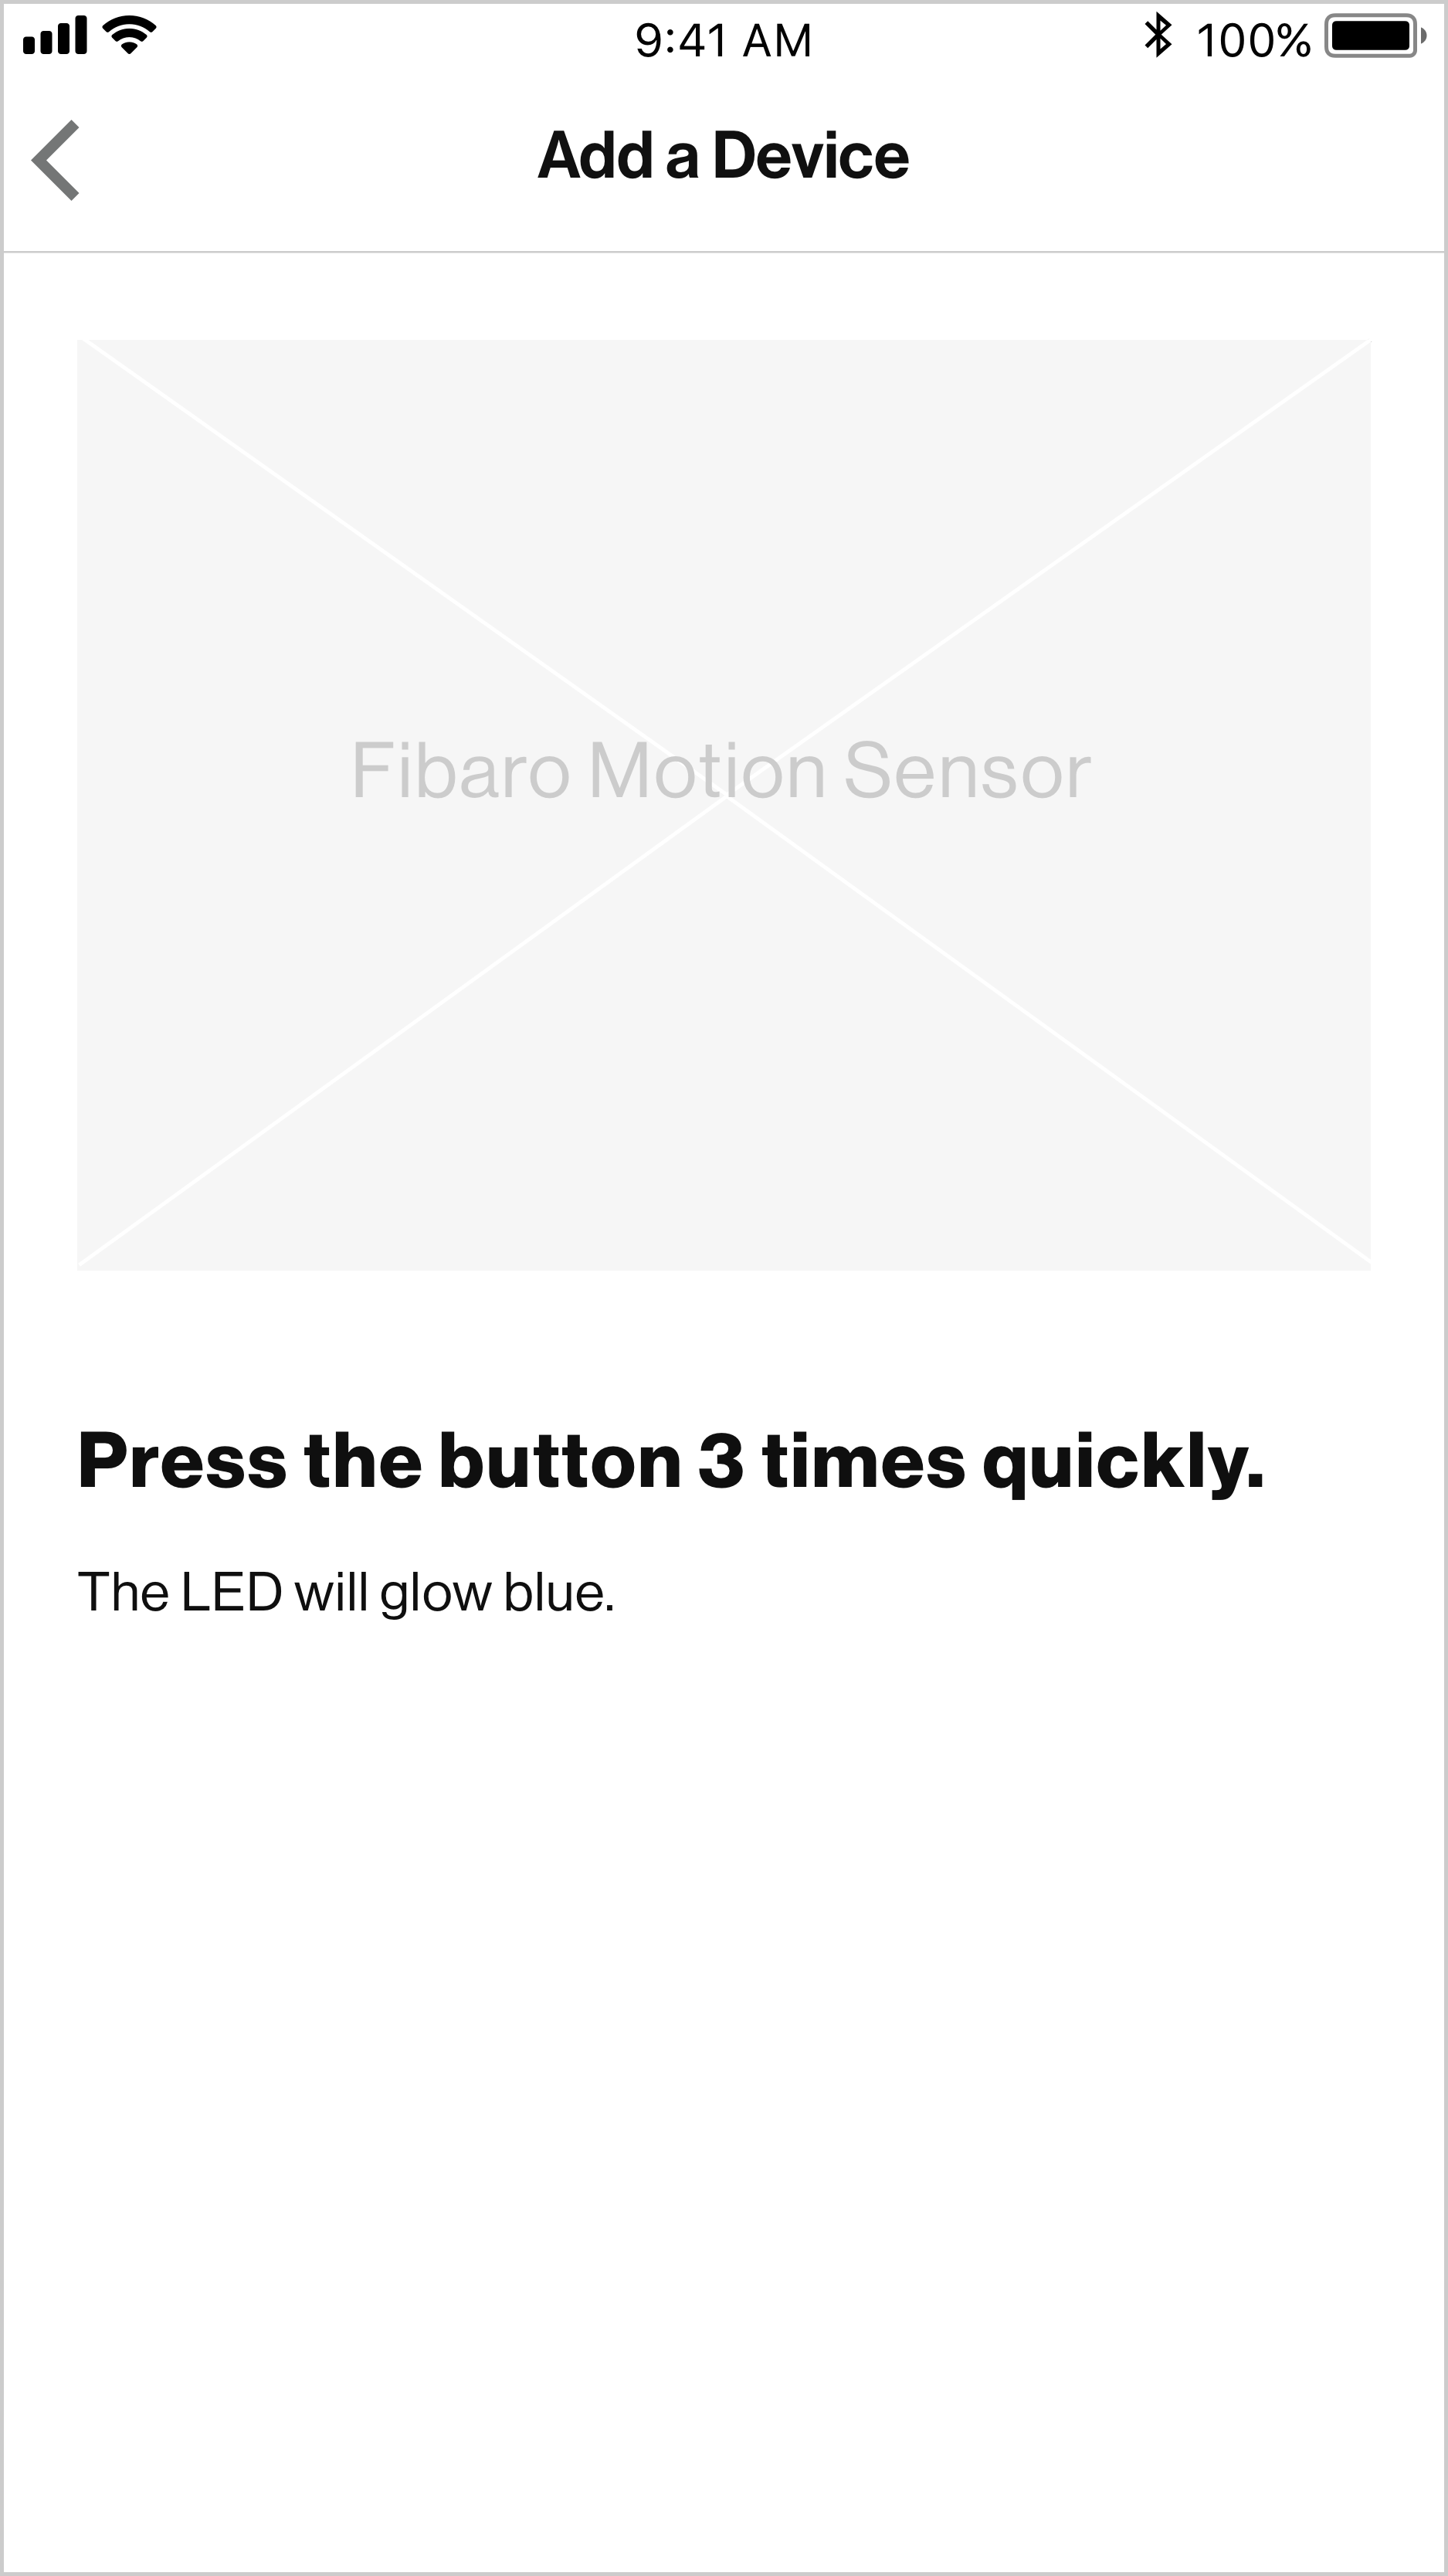 Find-Gadget-Pair-Final Copy (1).png